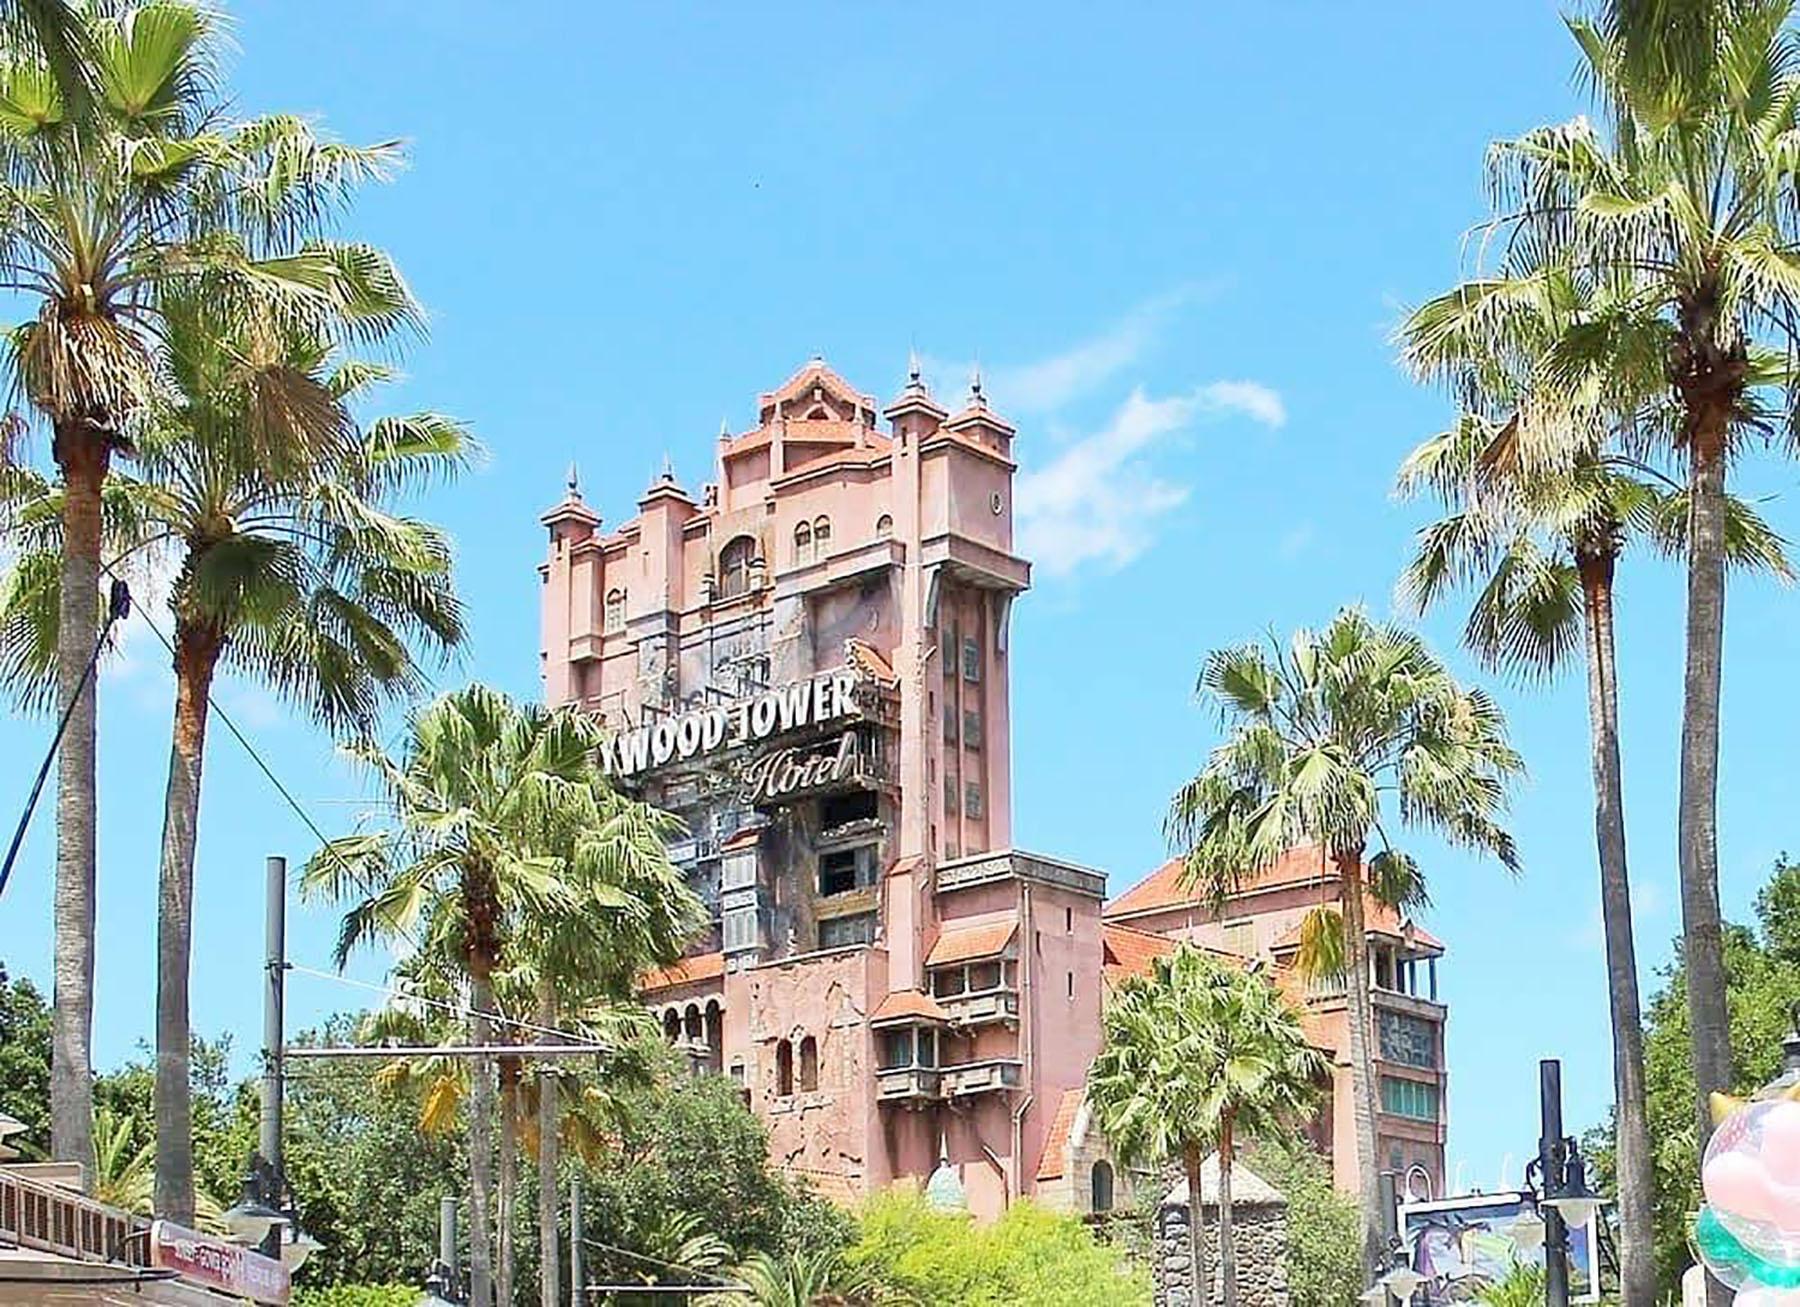 The Twilight Zone Tower of Terror in Disney Hollywood Studios